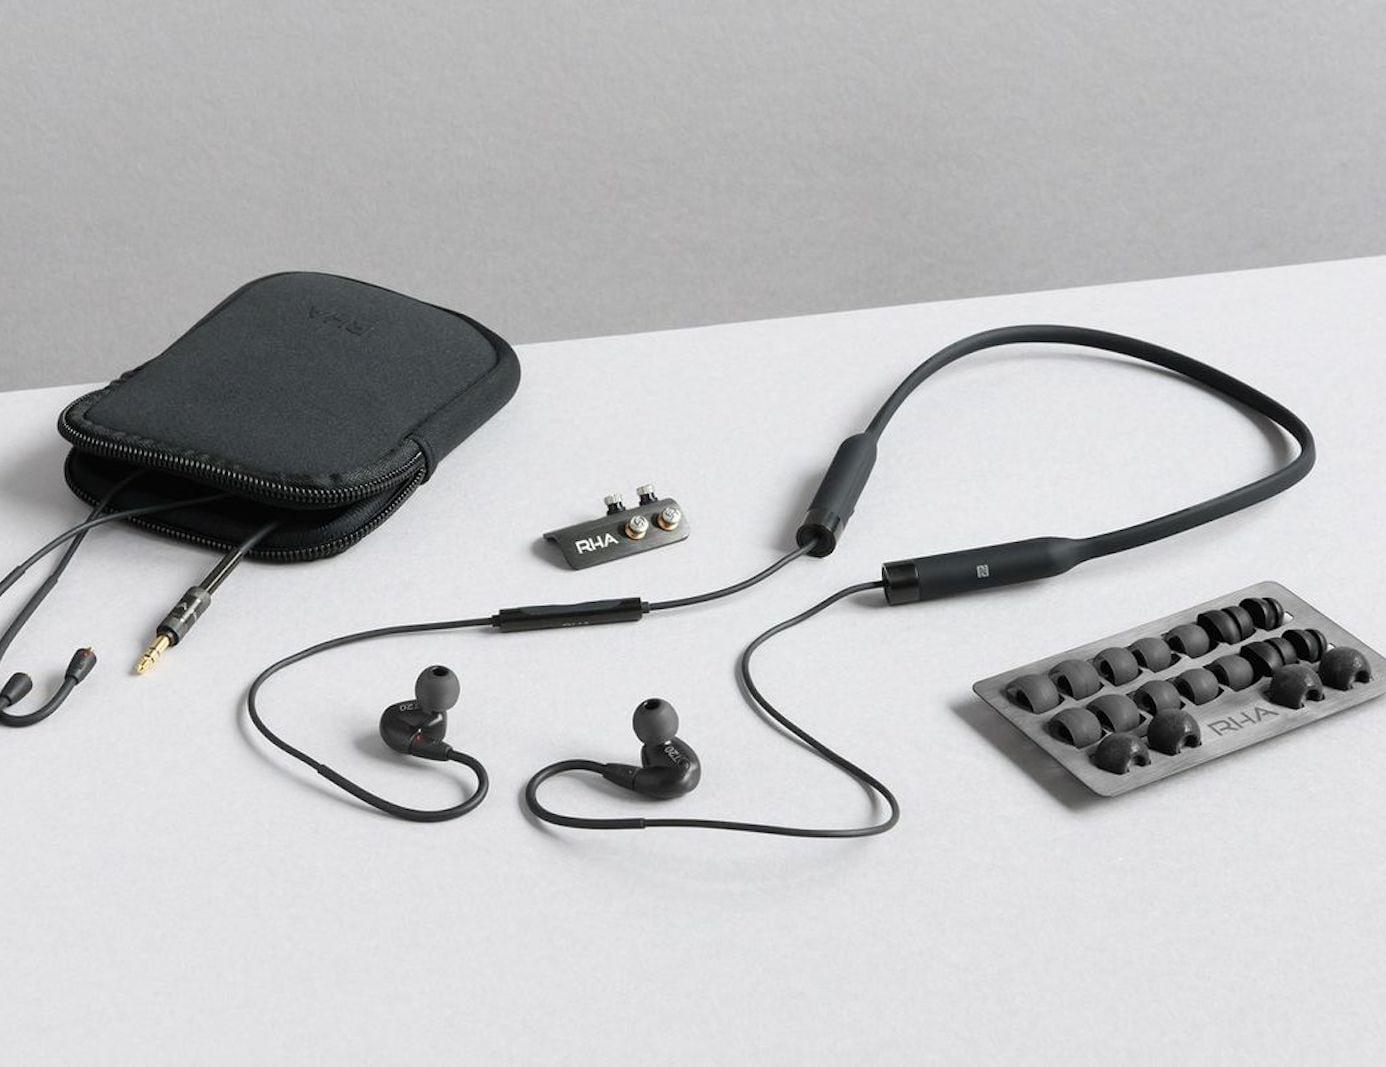 RHA T20 Wireless Wraparound Earbuds offer crystal clear sound quality